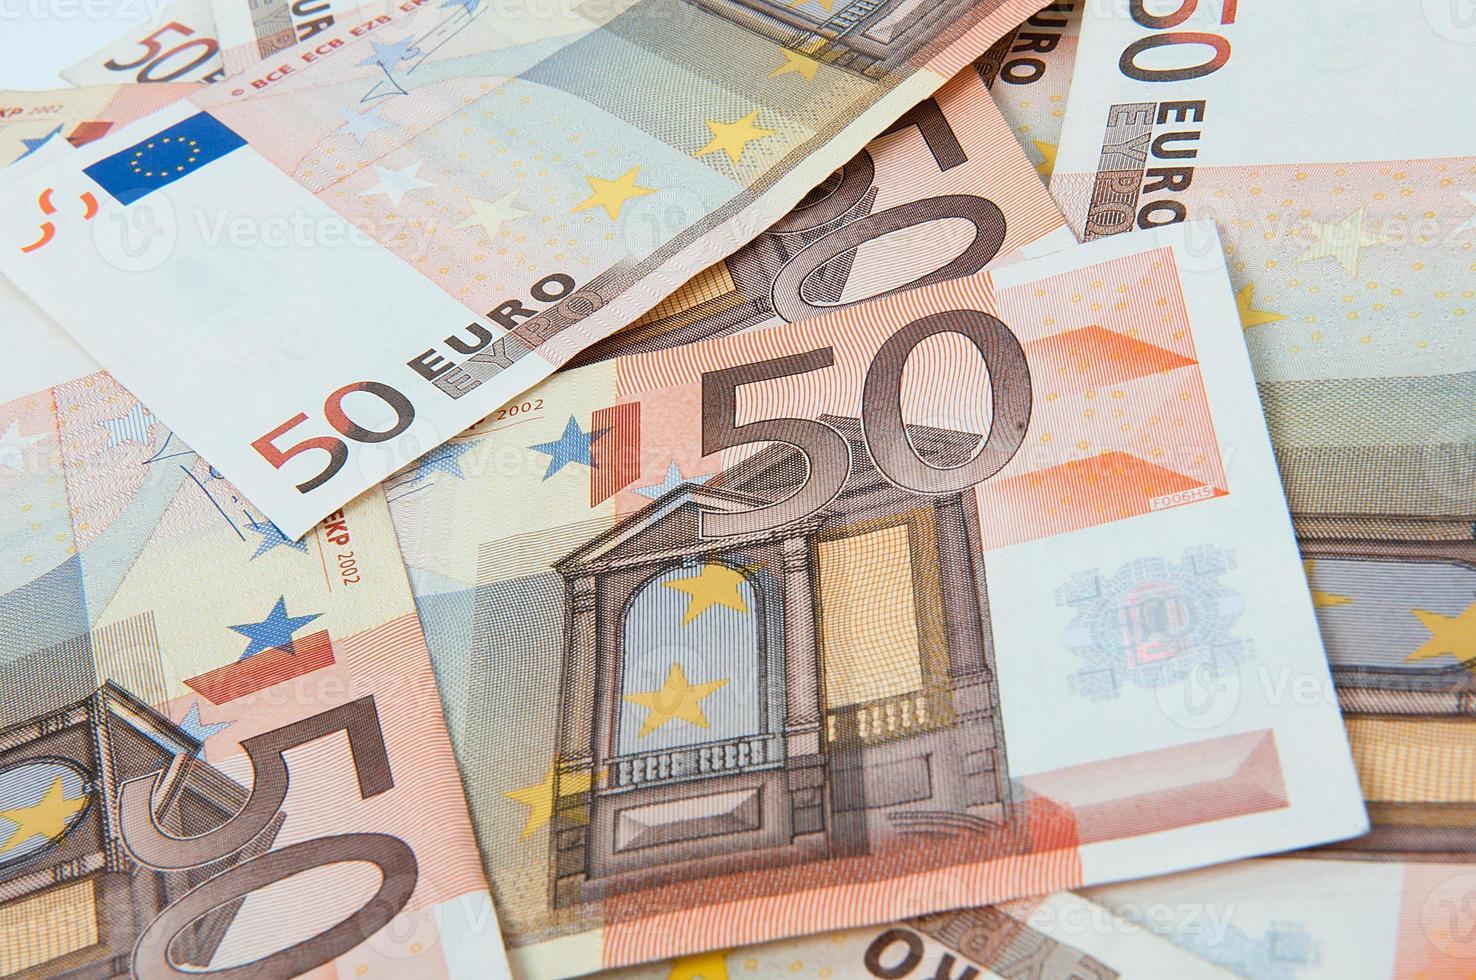 bankbiljet van vijftig euro foto